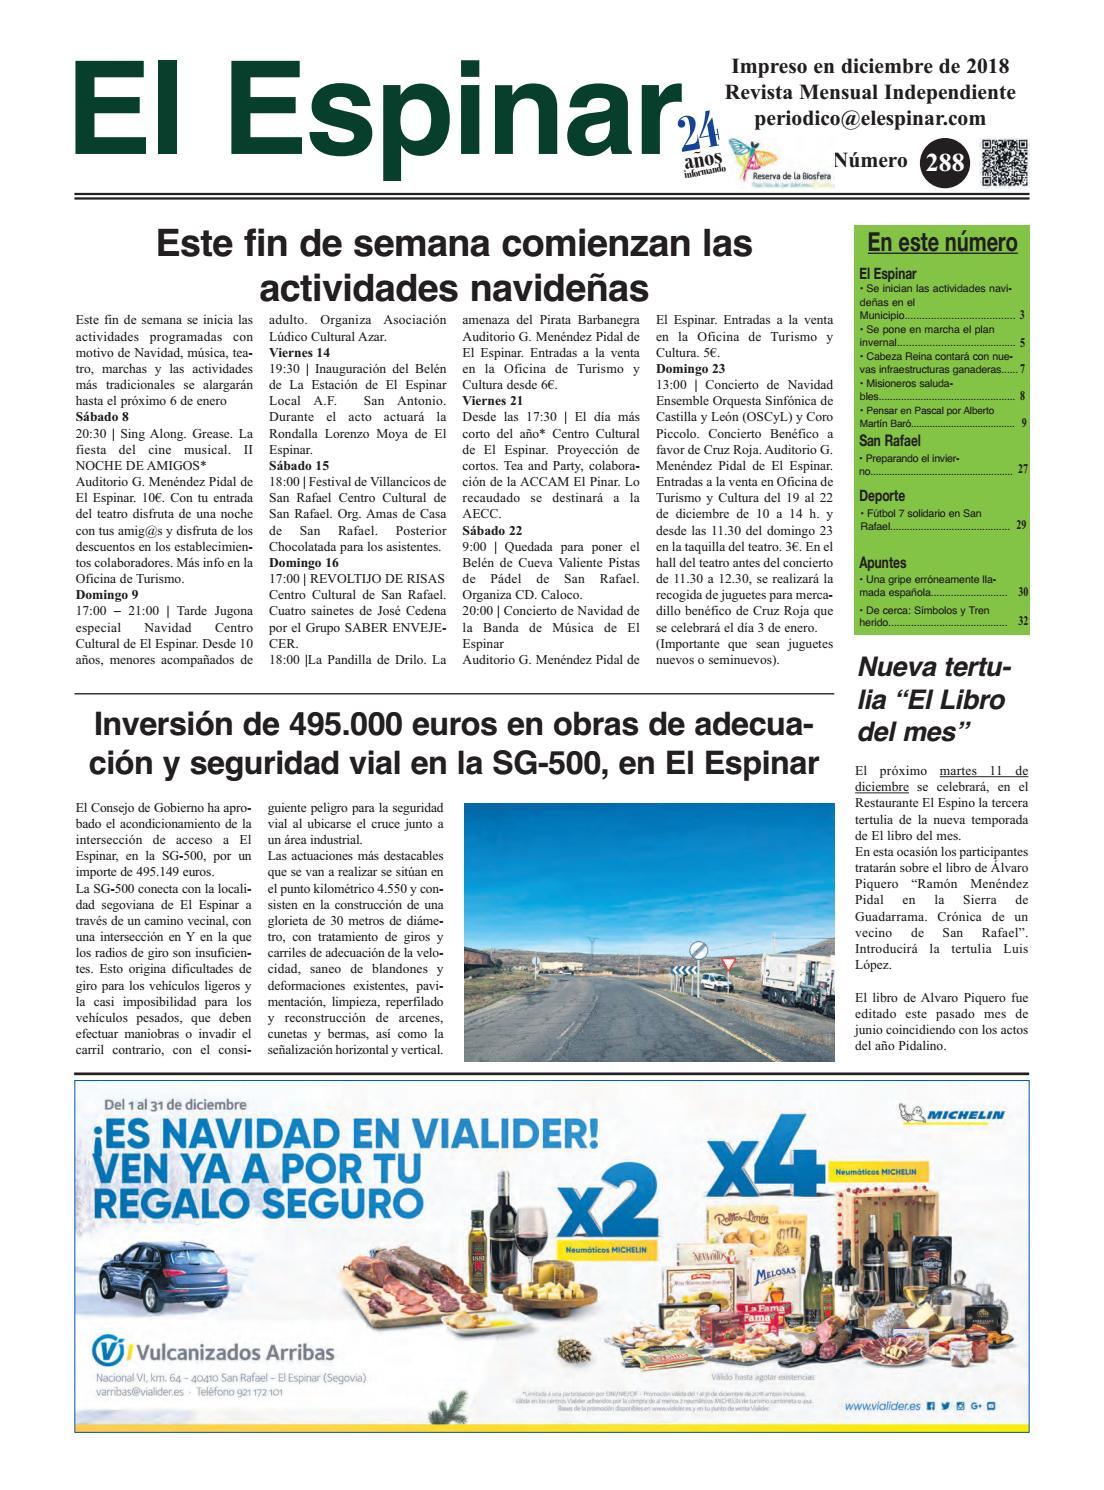 2d99a9bf96 Periódico El Espinar nº288 by juan jesus maria garcia - issuu